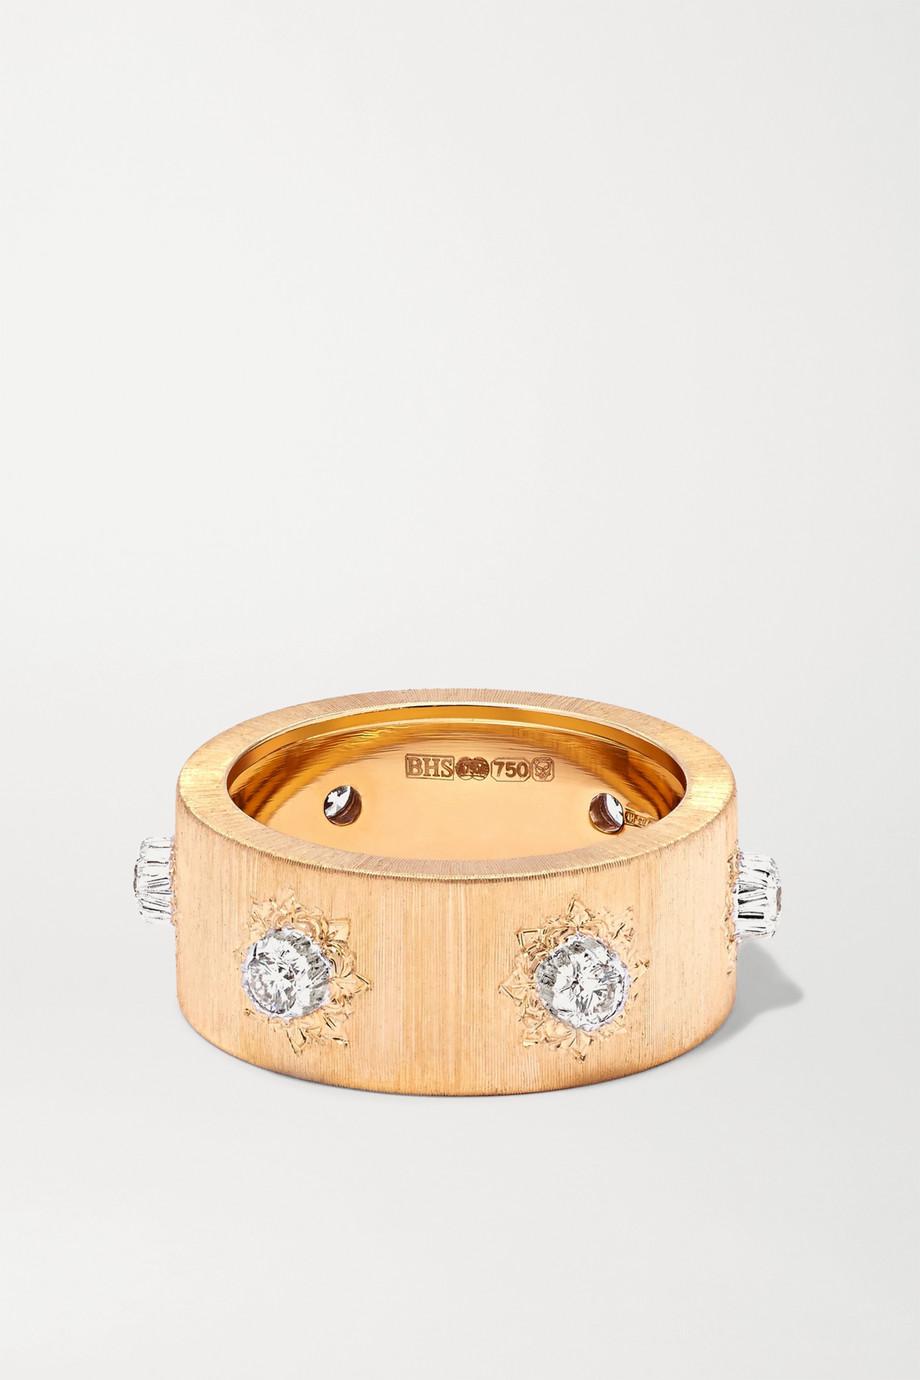 Buccellati Macri 18-karat yellow and white gold diamond ring